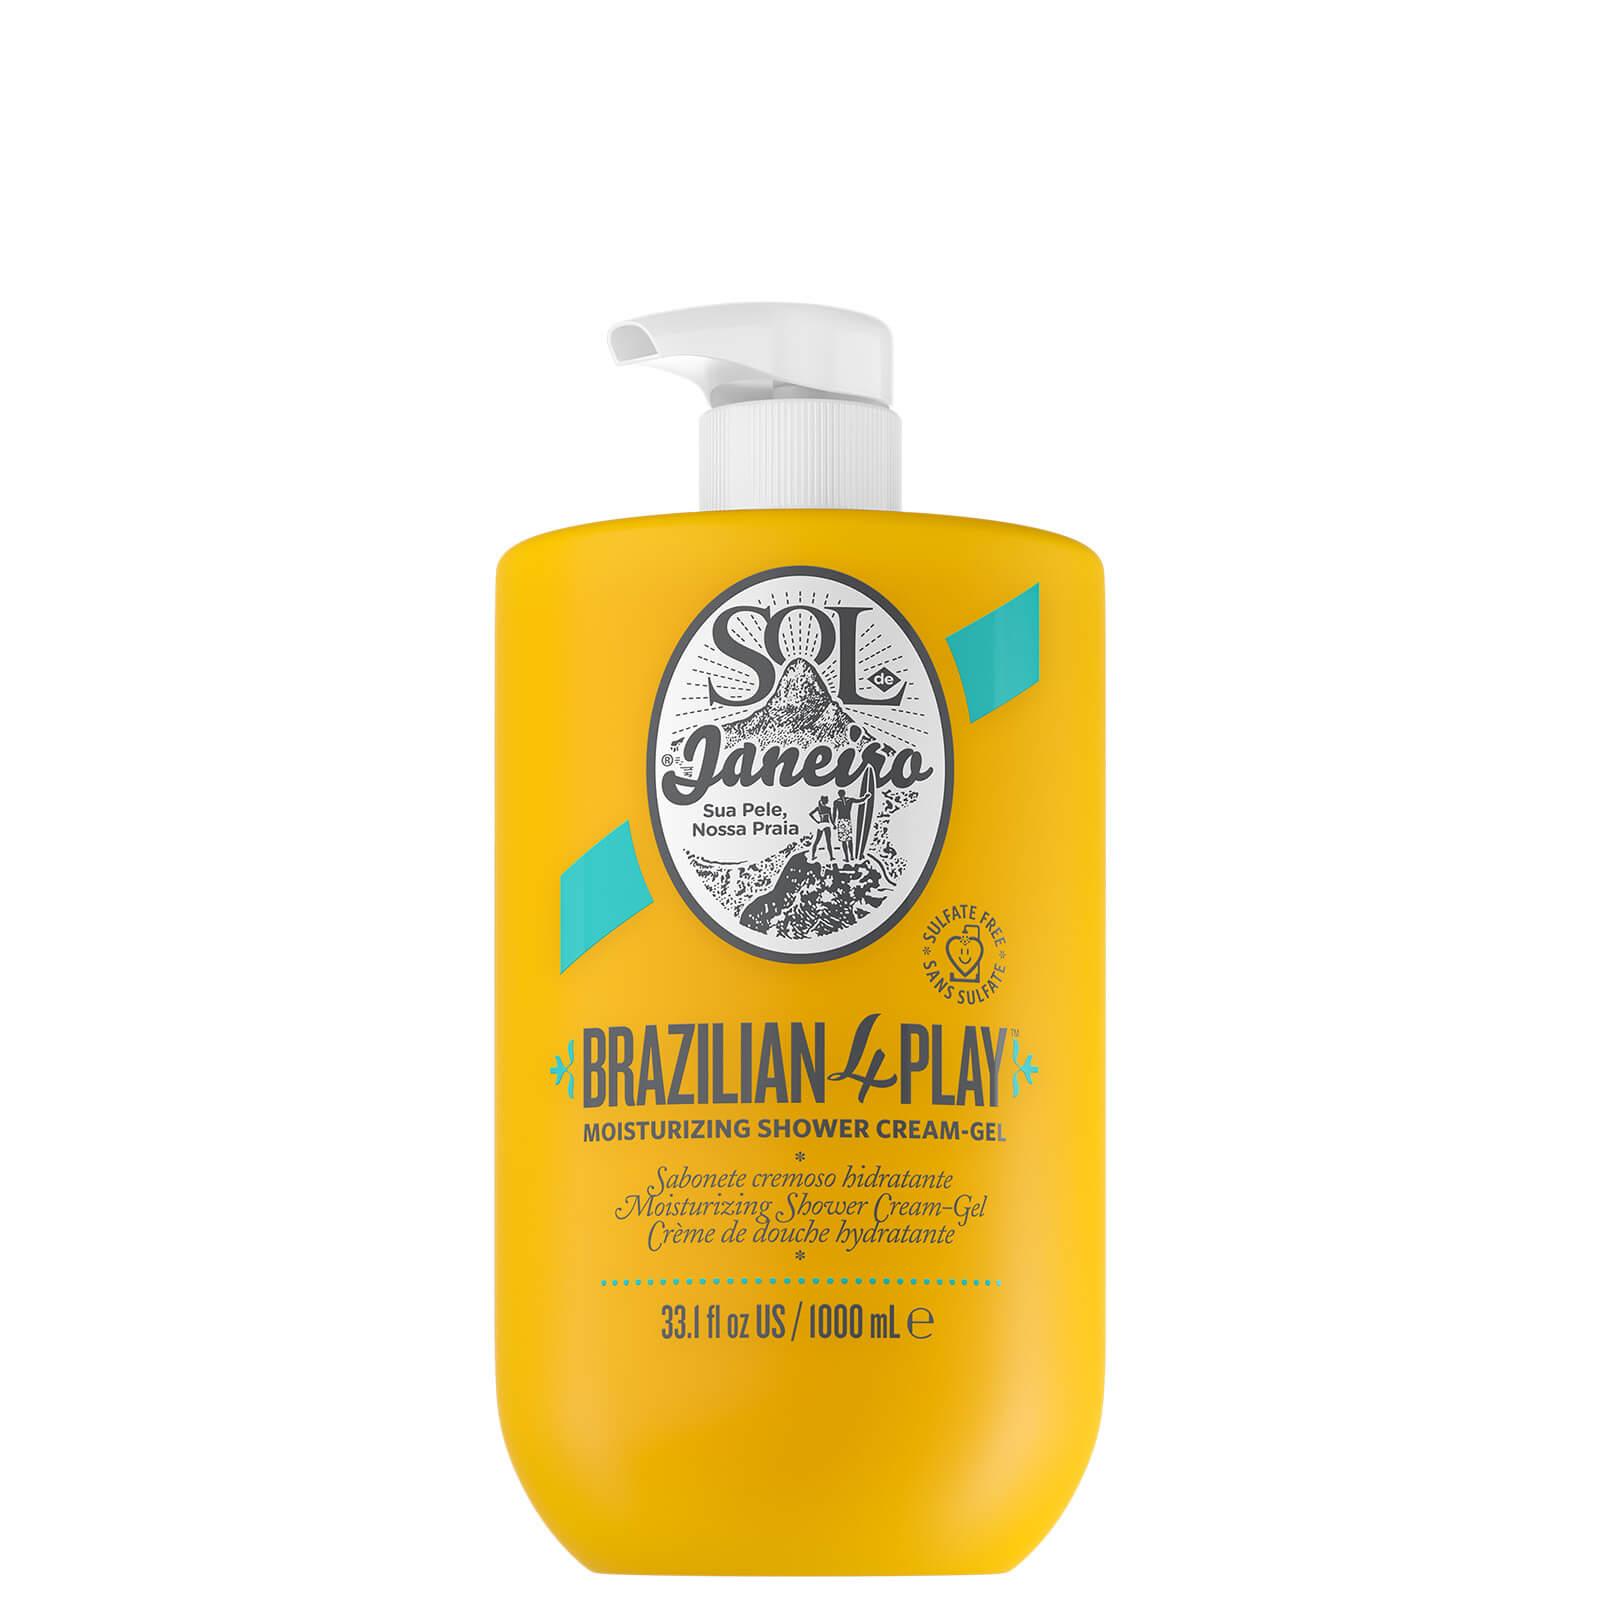 Sol de Janeiro Brazilian 4Play Moisturizing Shower Cream-Gel 1000ml  - Купить